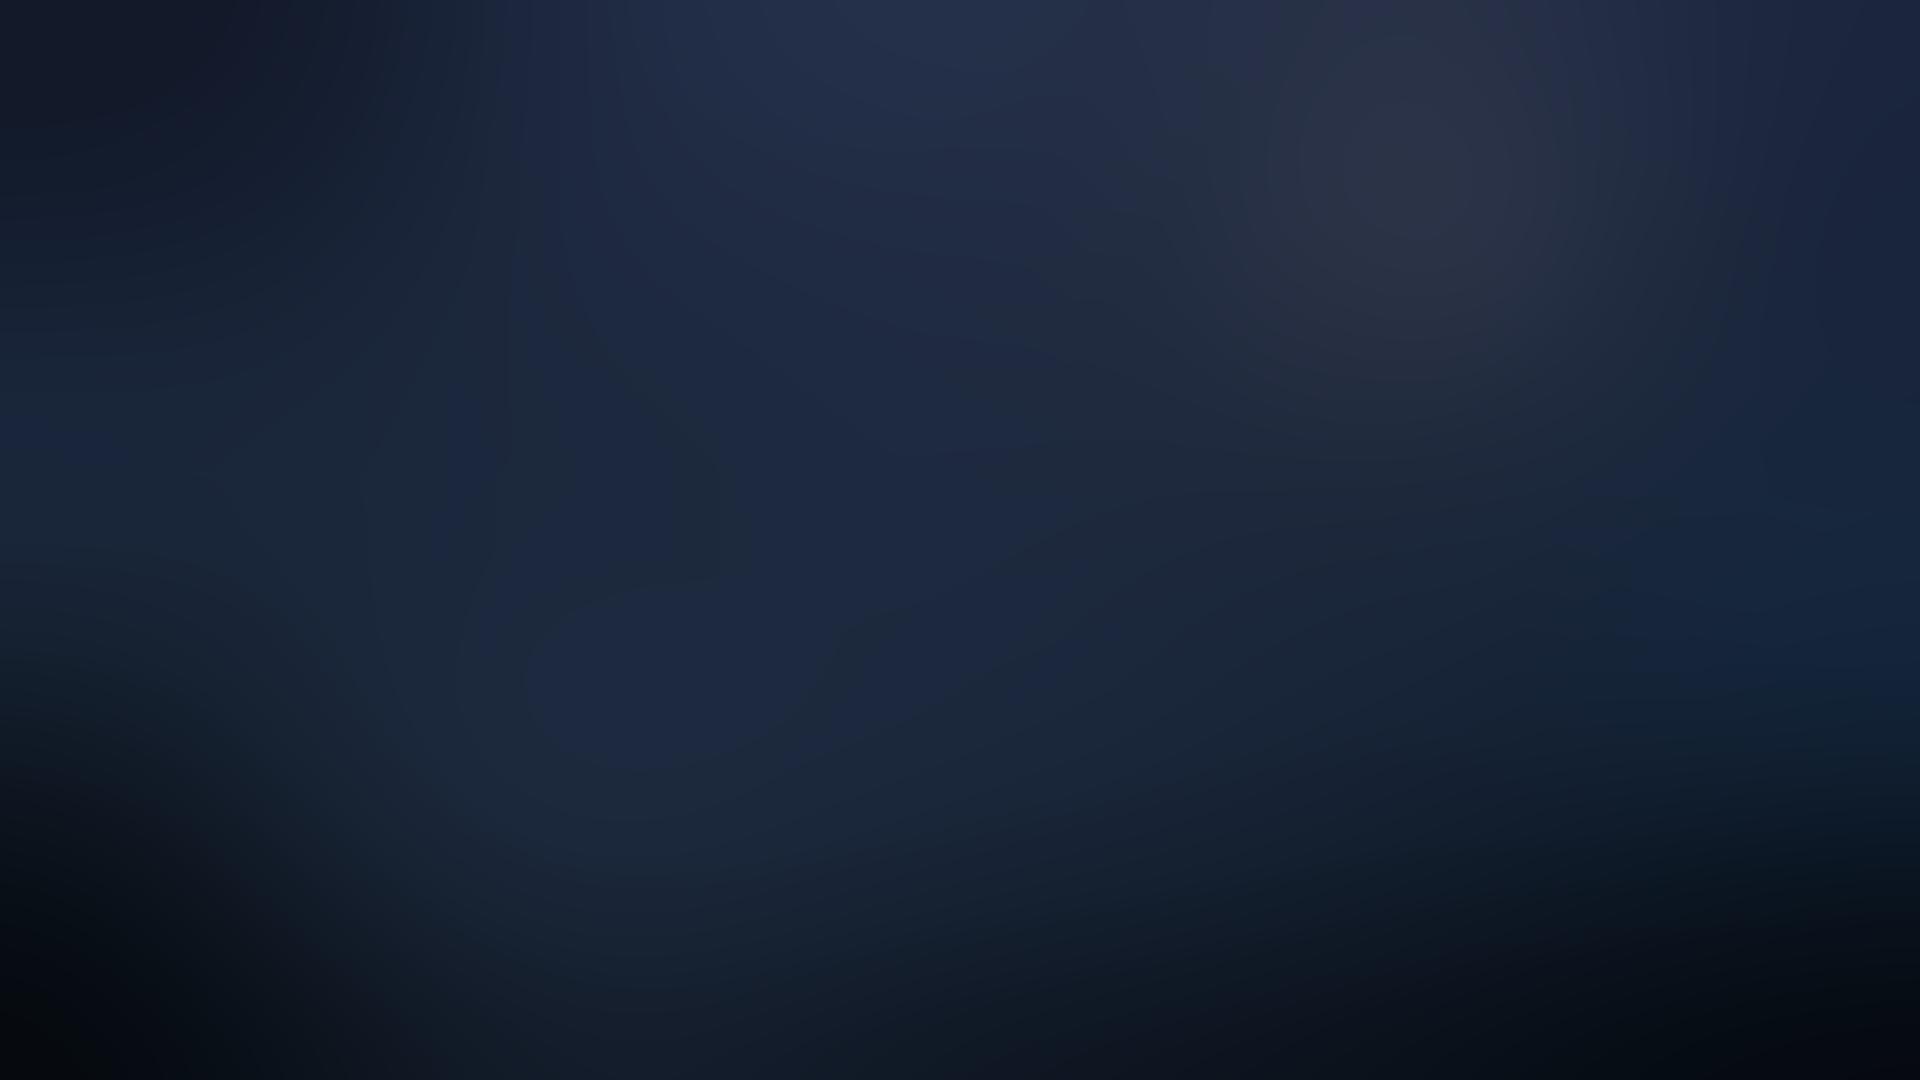 Blue Gradient Wallpaper 1920x1080 Blue Gradient 1920x1080